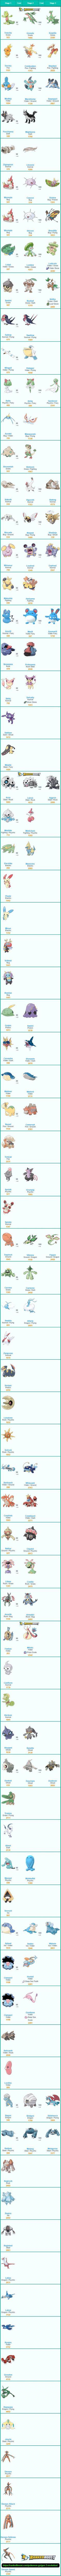 Pokemon GO Gen 3 Evolutions | Prepare For The Generation 3 of Pokemon GO #POkemonGoTips